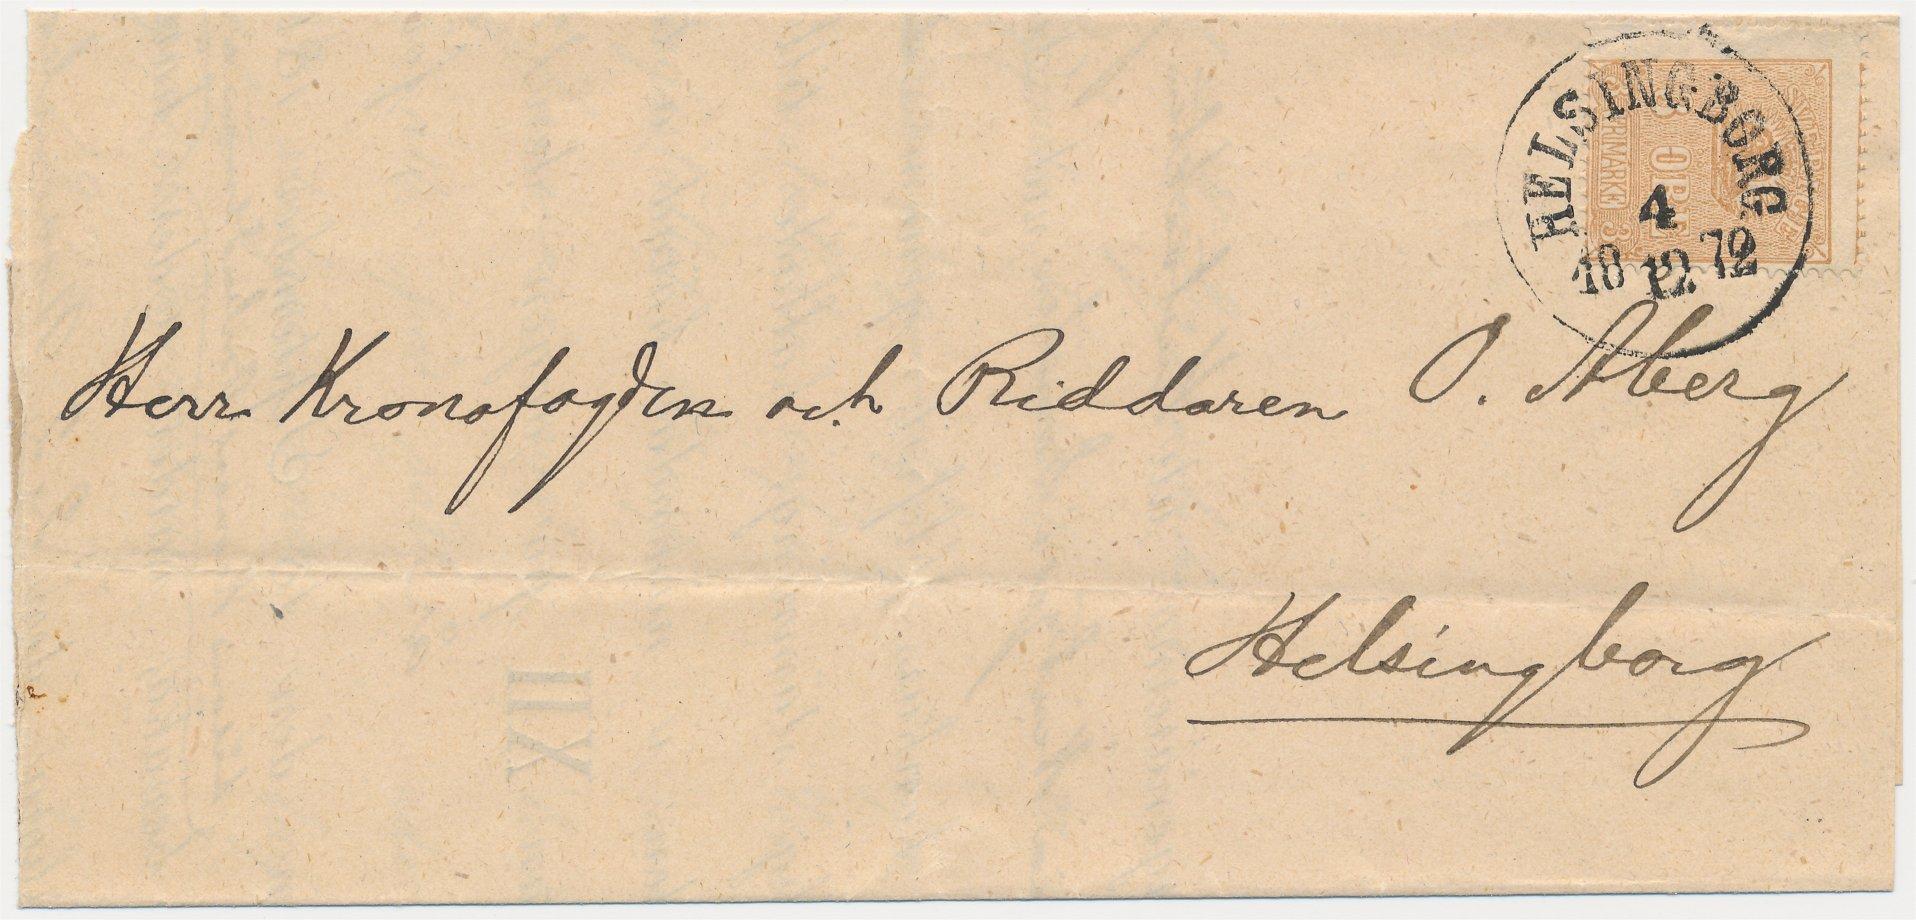 3_helsingborg_4_12_1872